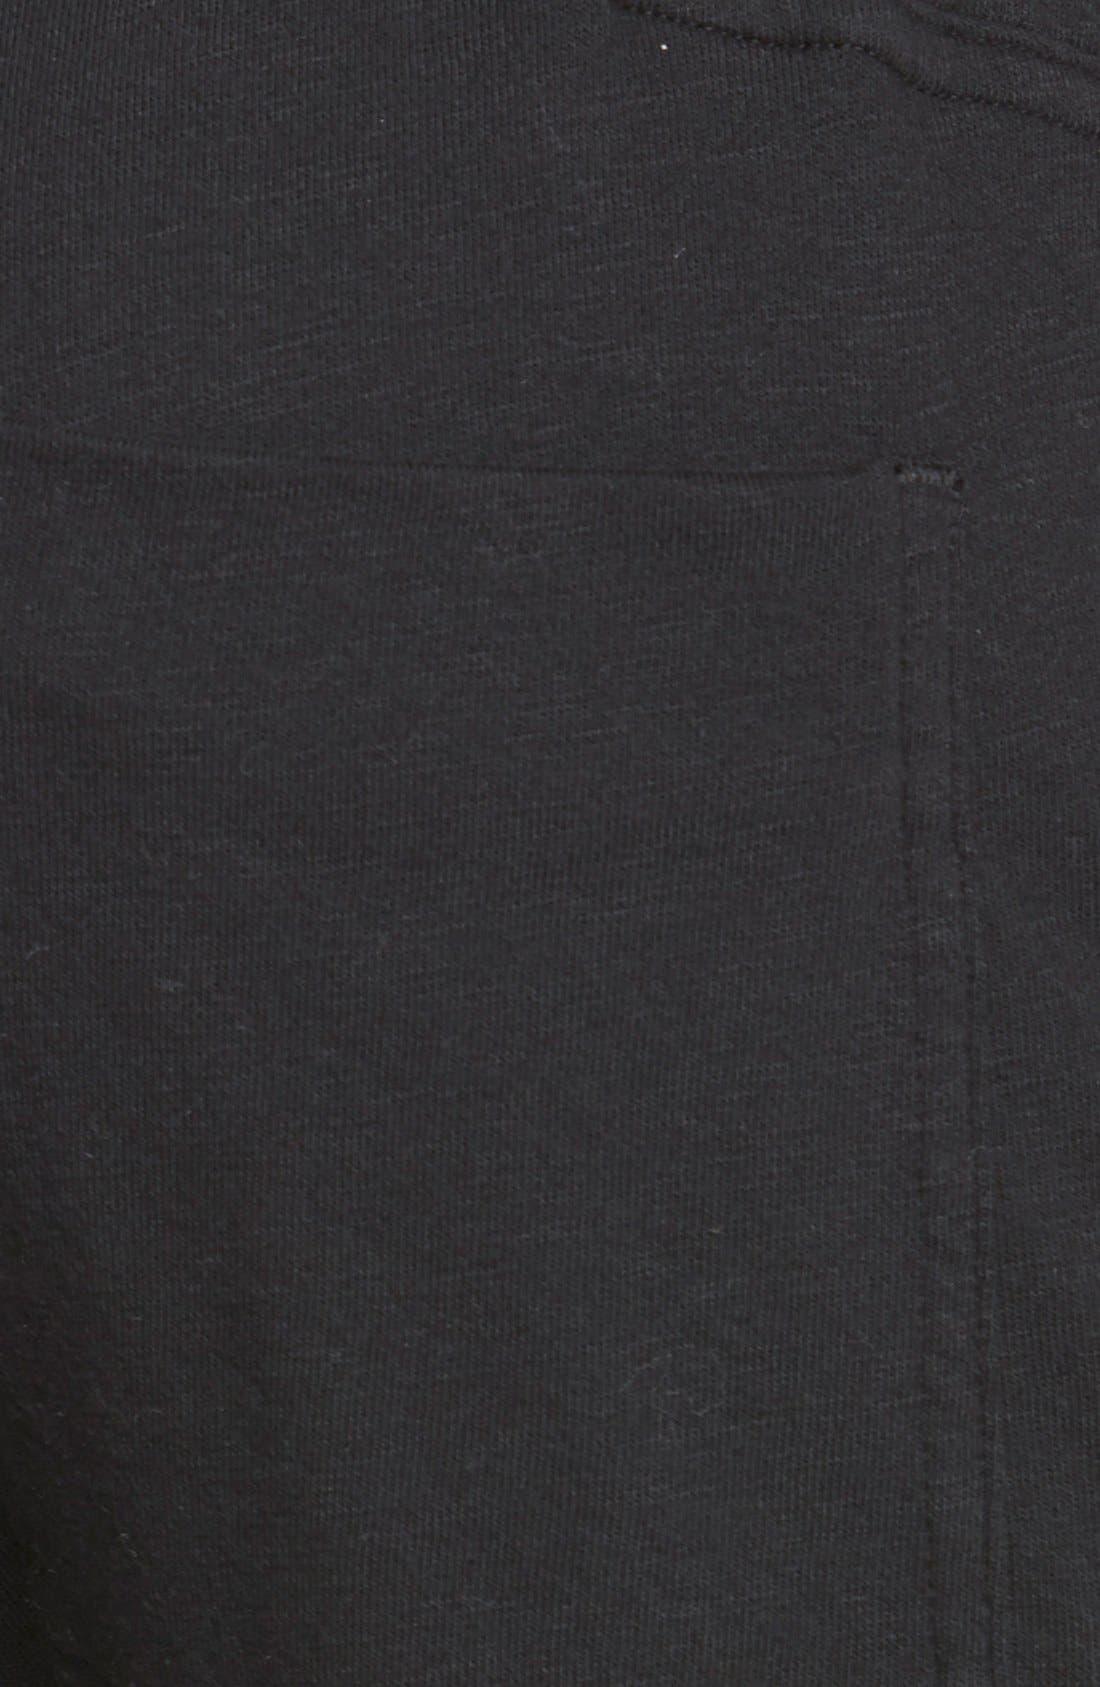 Slouchy Sweatpants,                             Alternate thumbnail 3, color,                             001